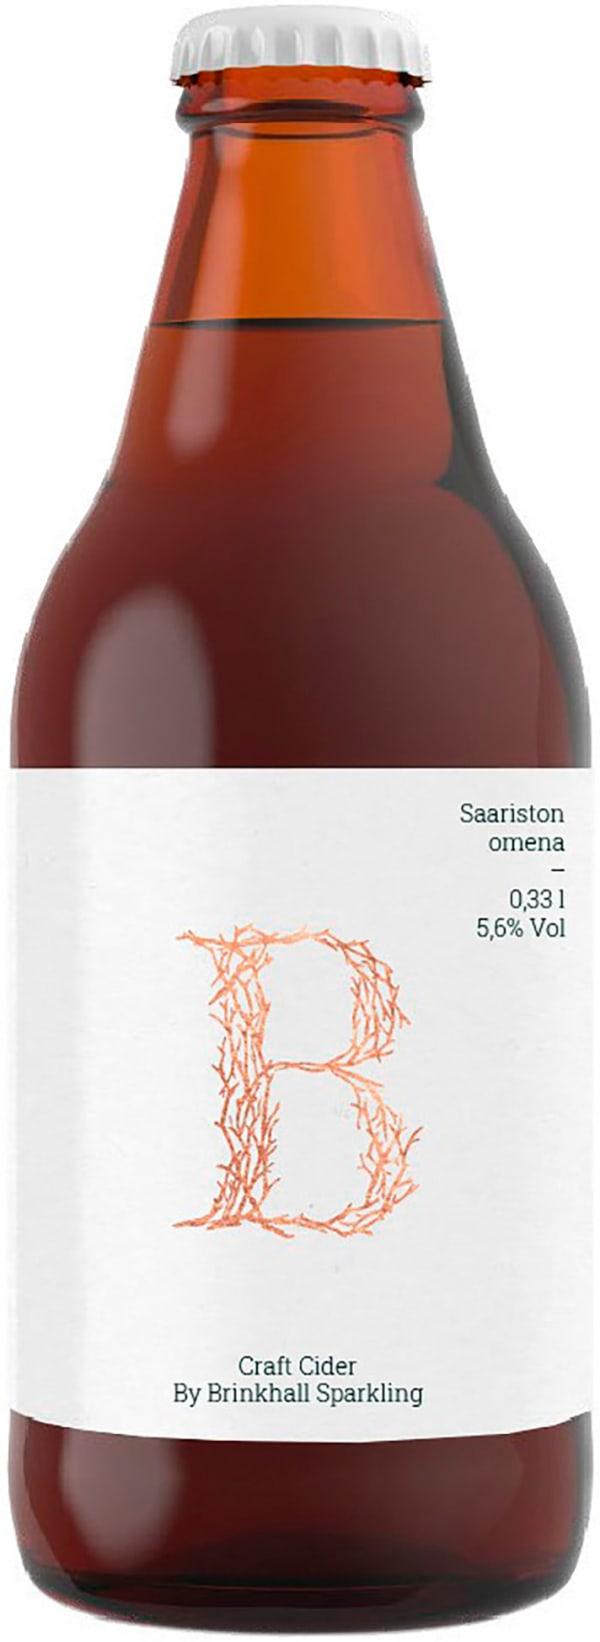 Brinkhall's Saariston Omena Craft Cider